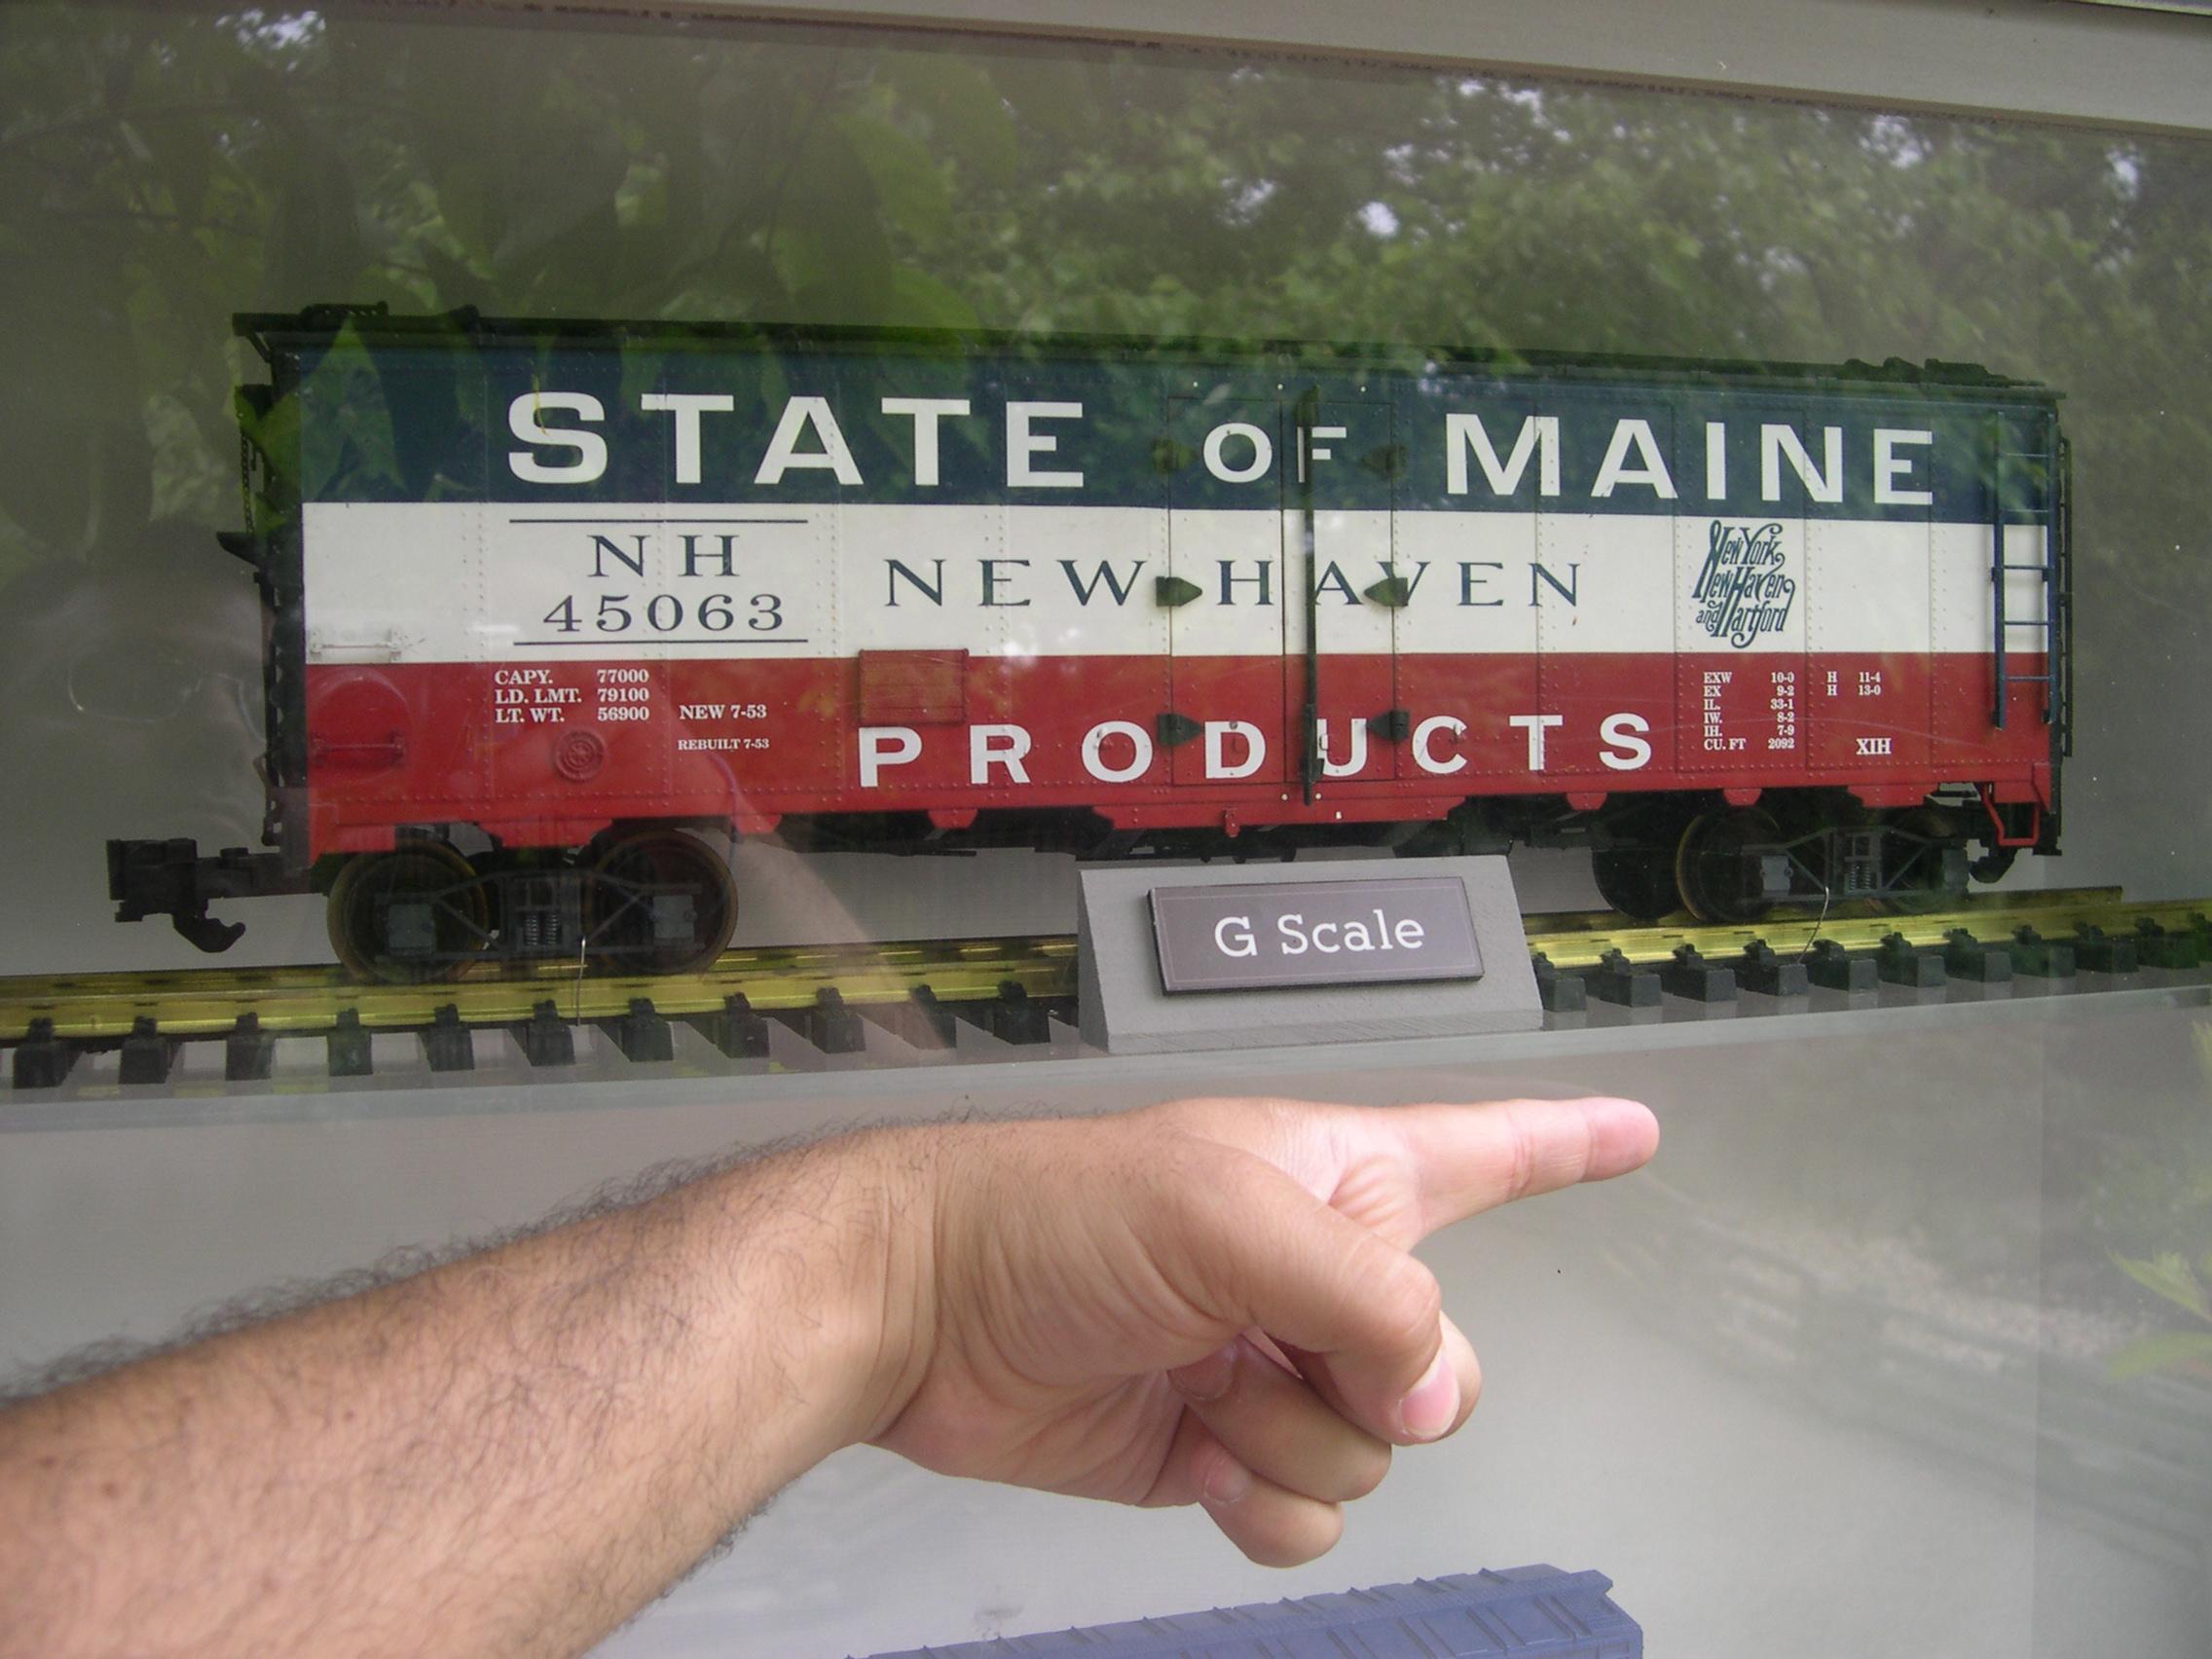 G scale garden railroad